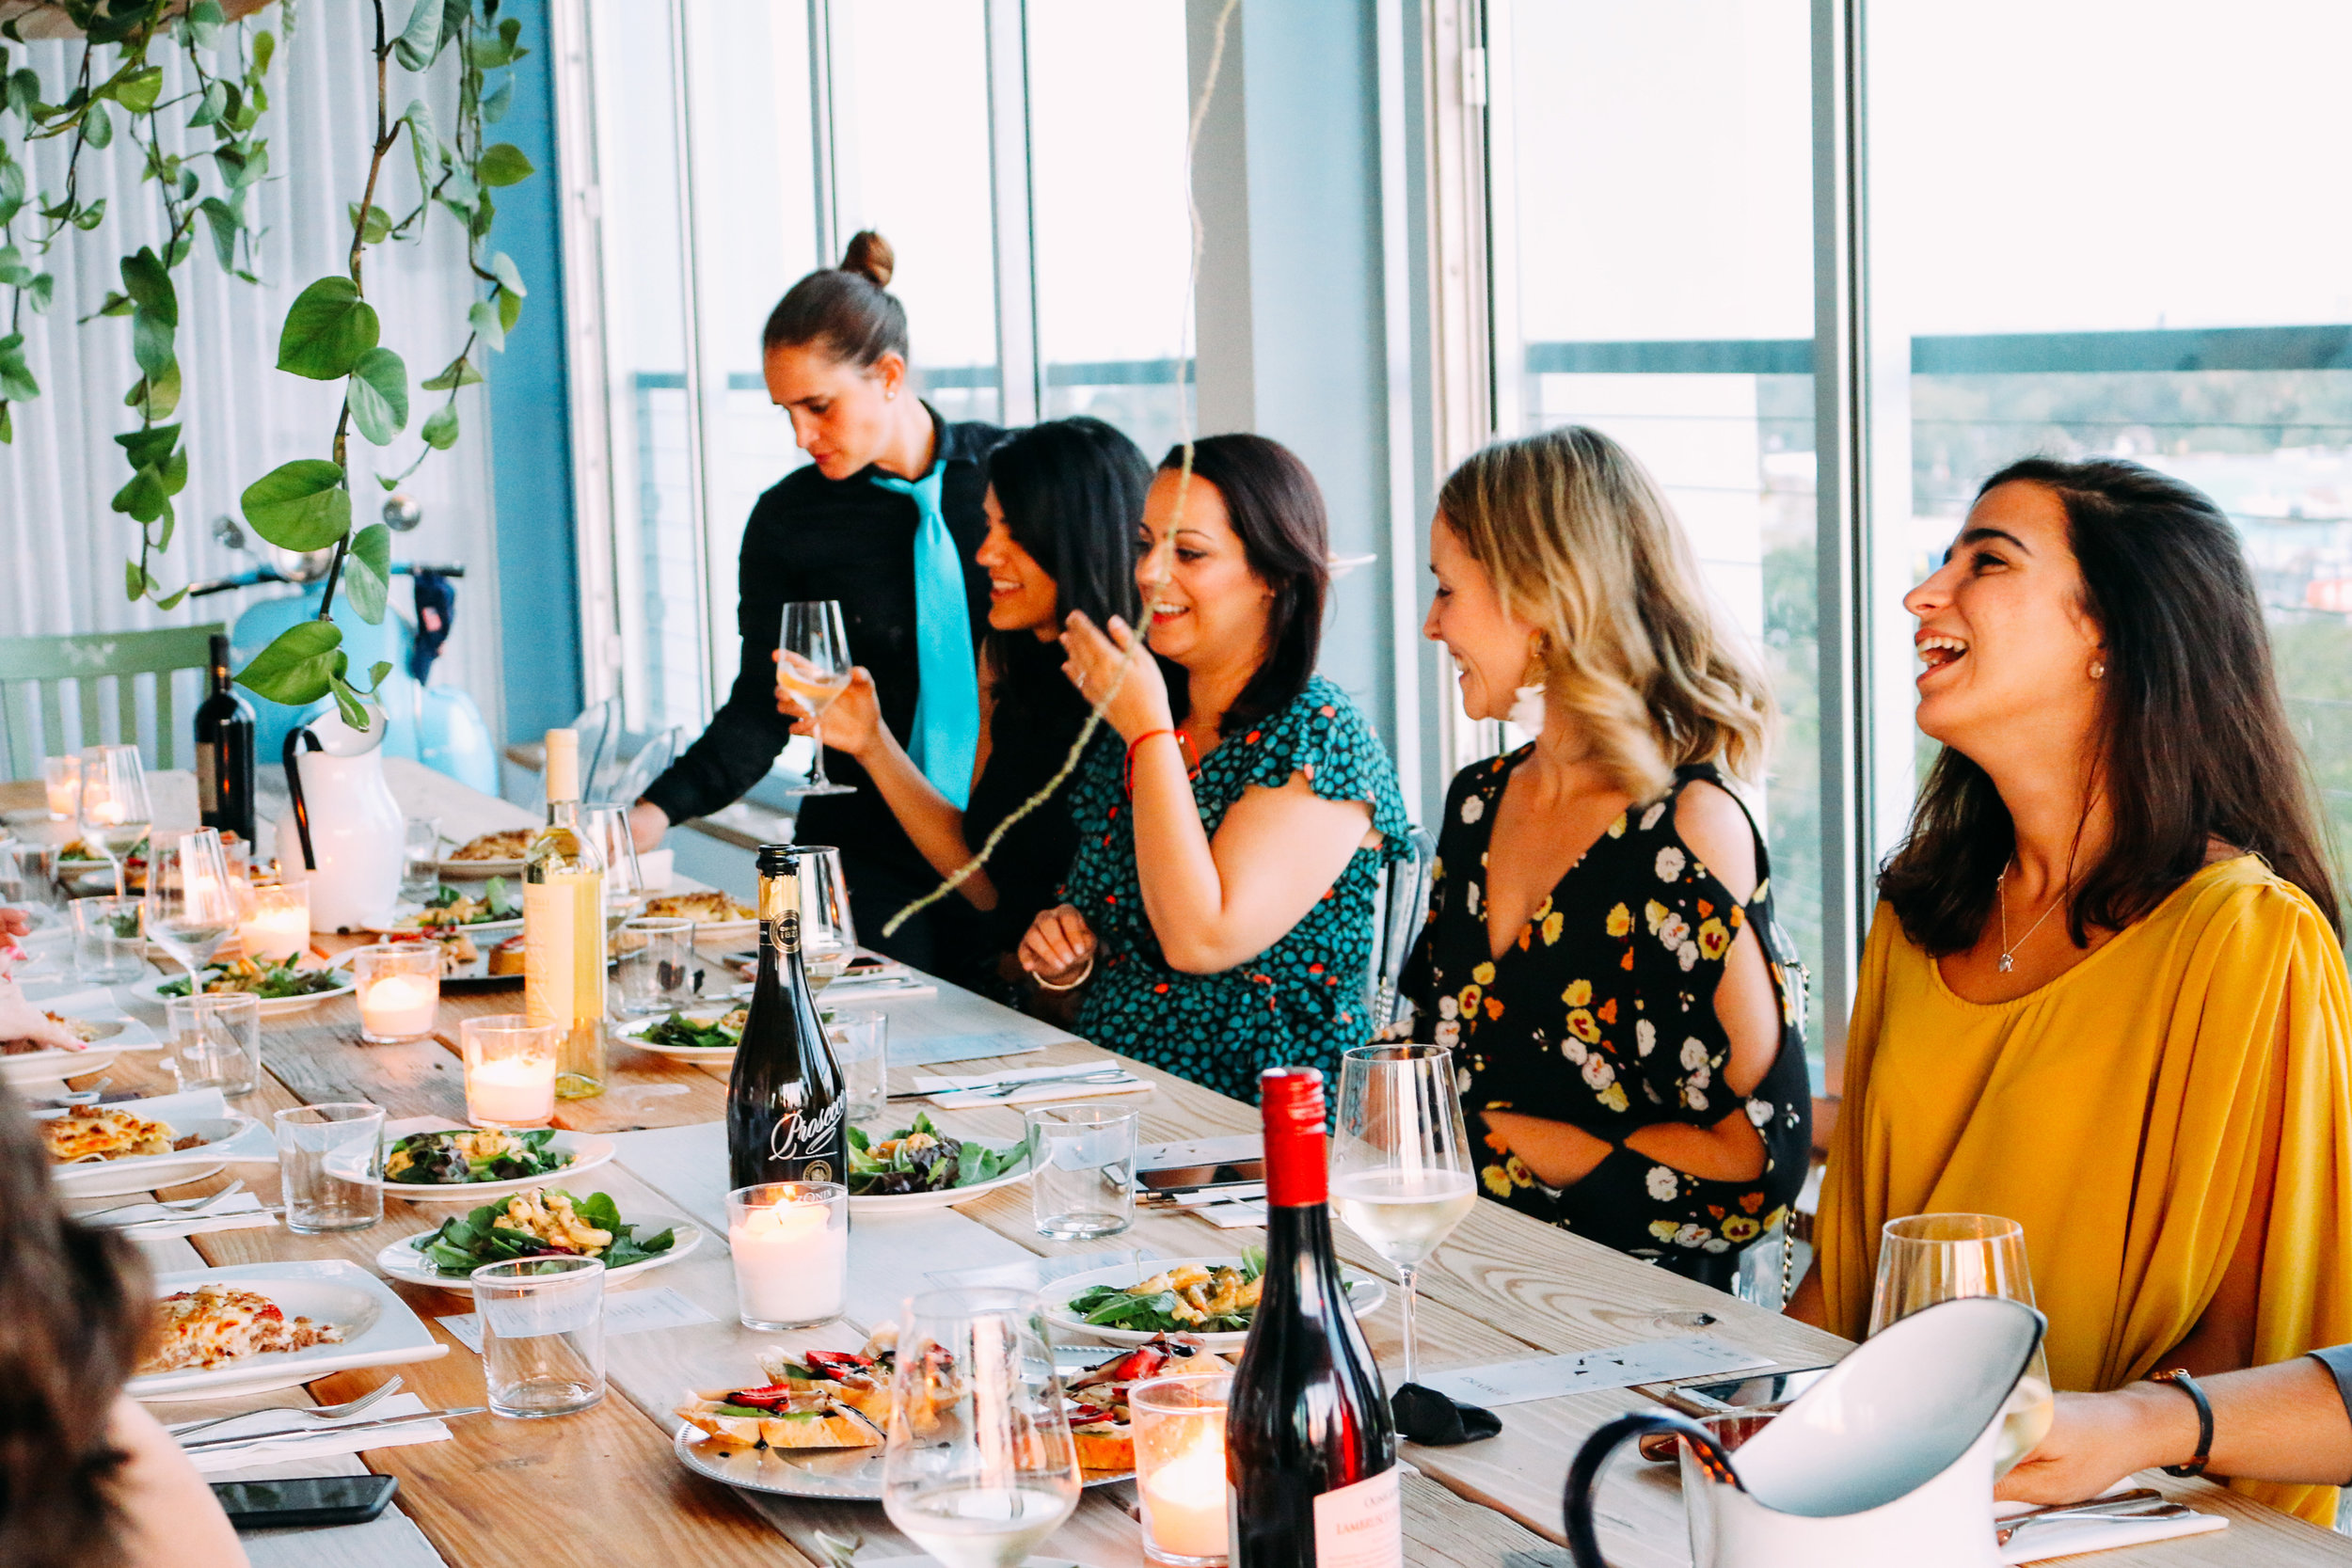 Women Who Wine Uncorked Conversations-Miami Wine Events-Wine Tasting Miami-49.jpg